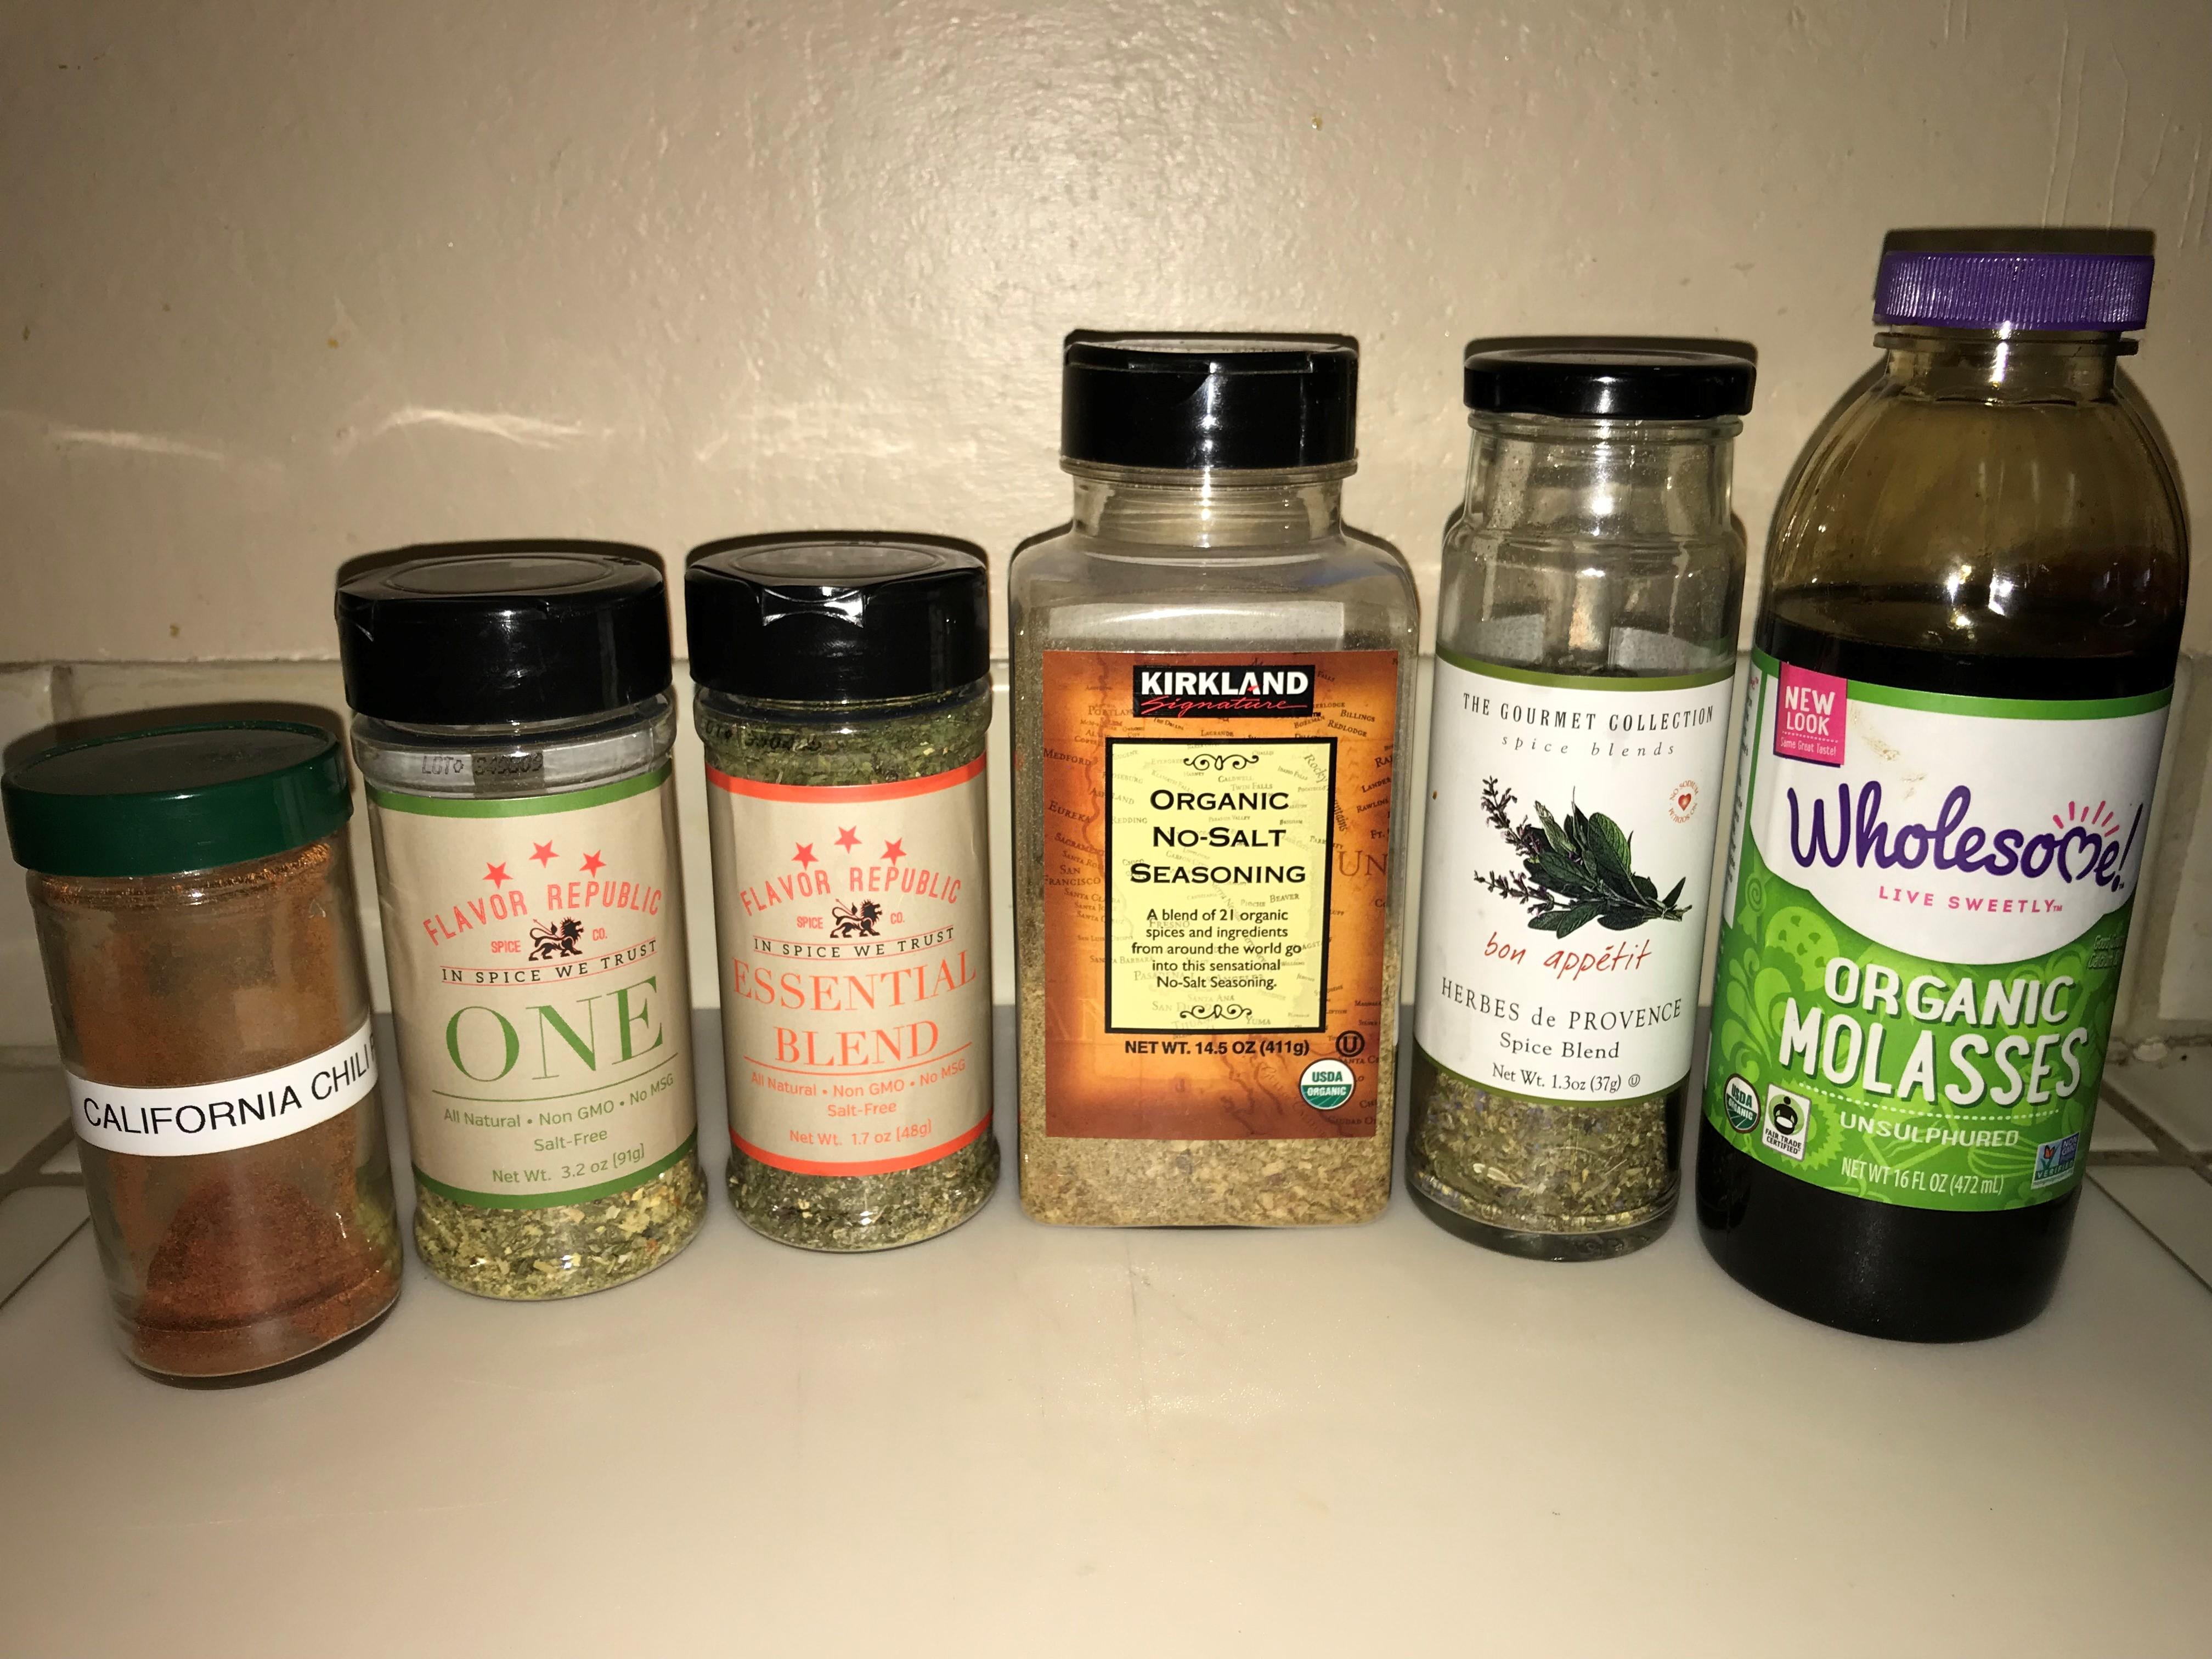 Oatmeal seasonings